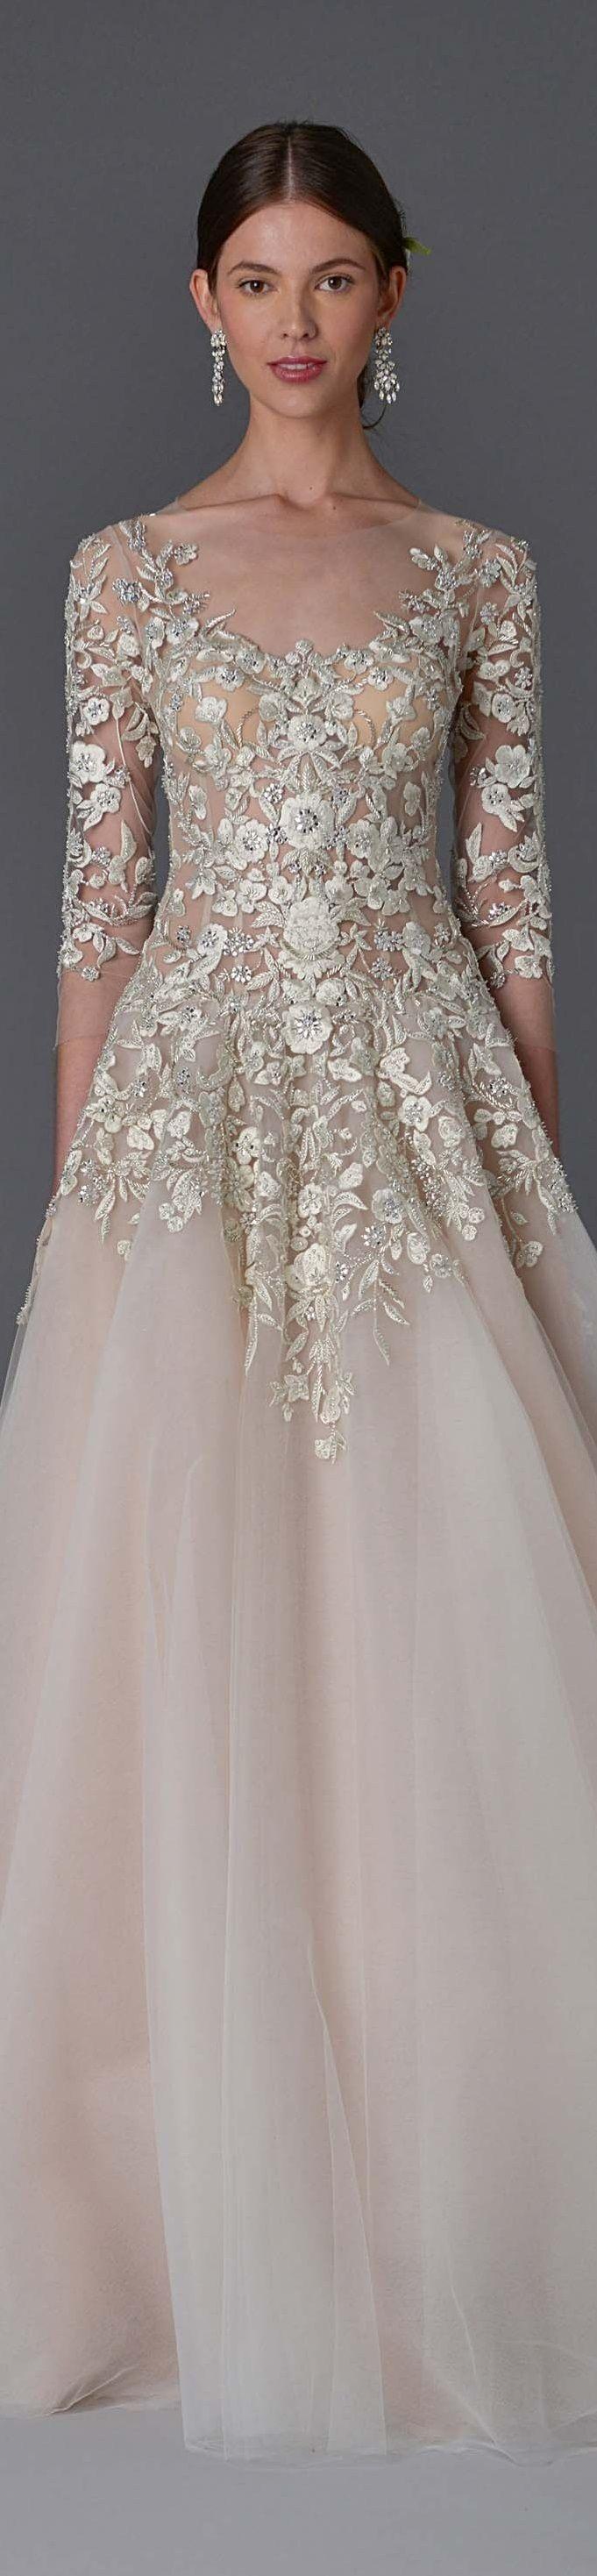 Informal wedding dresses for second marriage   best weddings images on Pinterest  Weddings Short wedding